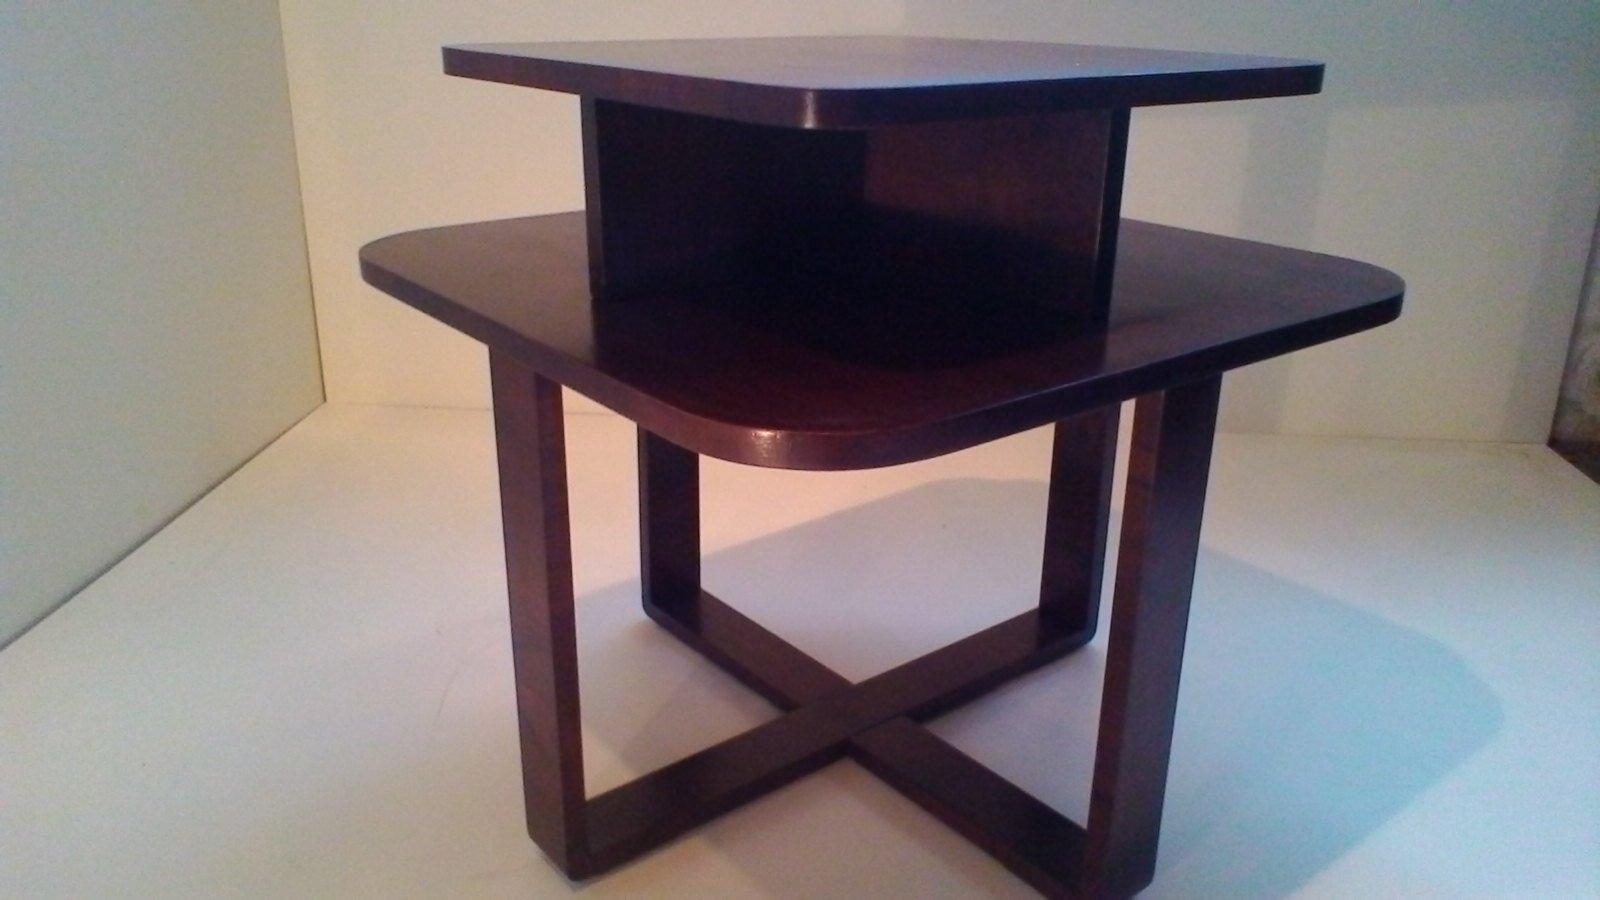 rechteckiger art deco bugholz couchtisch bei pamono kaufen. Black Bedroom Furniture Sets. Home Design Ideas